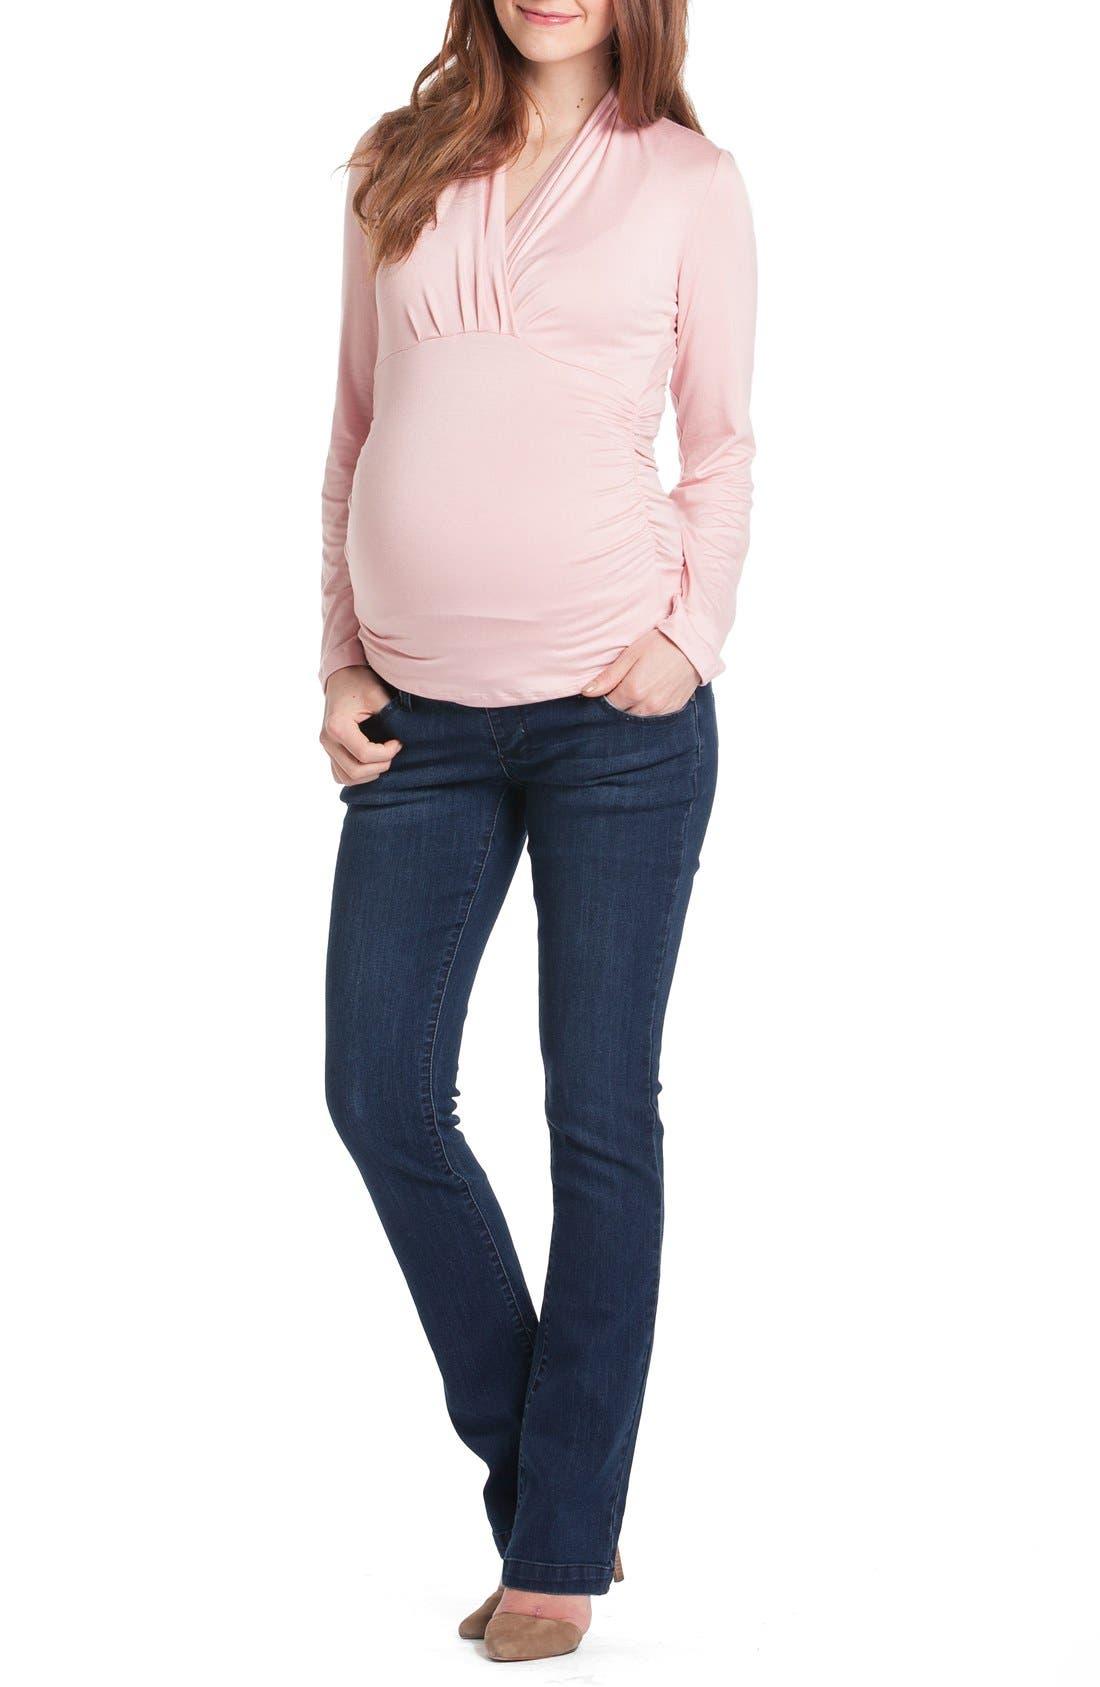 Lilac Clothing Megan Maternity Top